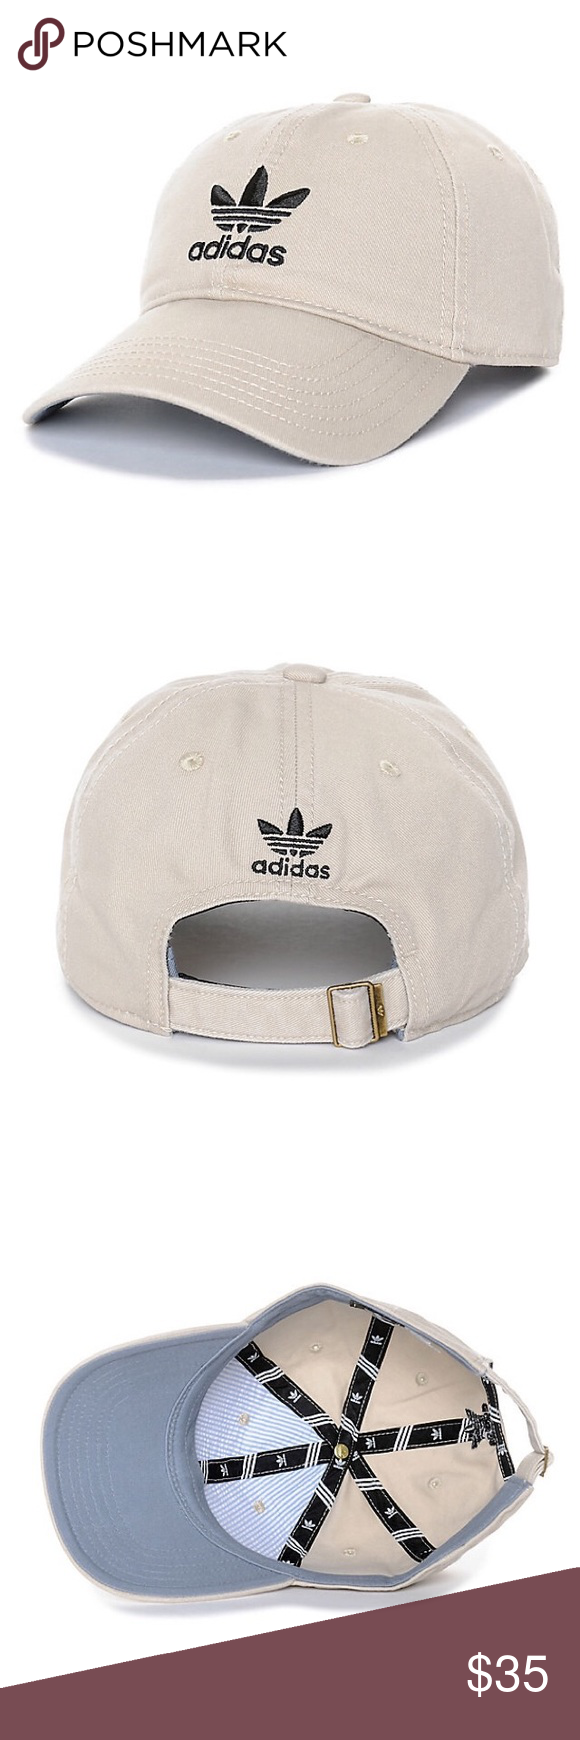 ffb45a75c7b55 Adidas Originals Relaxed Dad Baseball Hat ✨Color  Khaki   Black ❤️The khaki  adidas